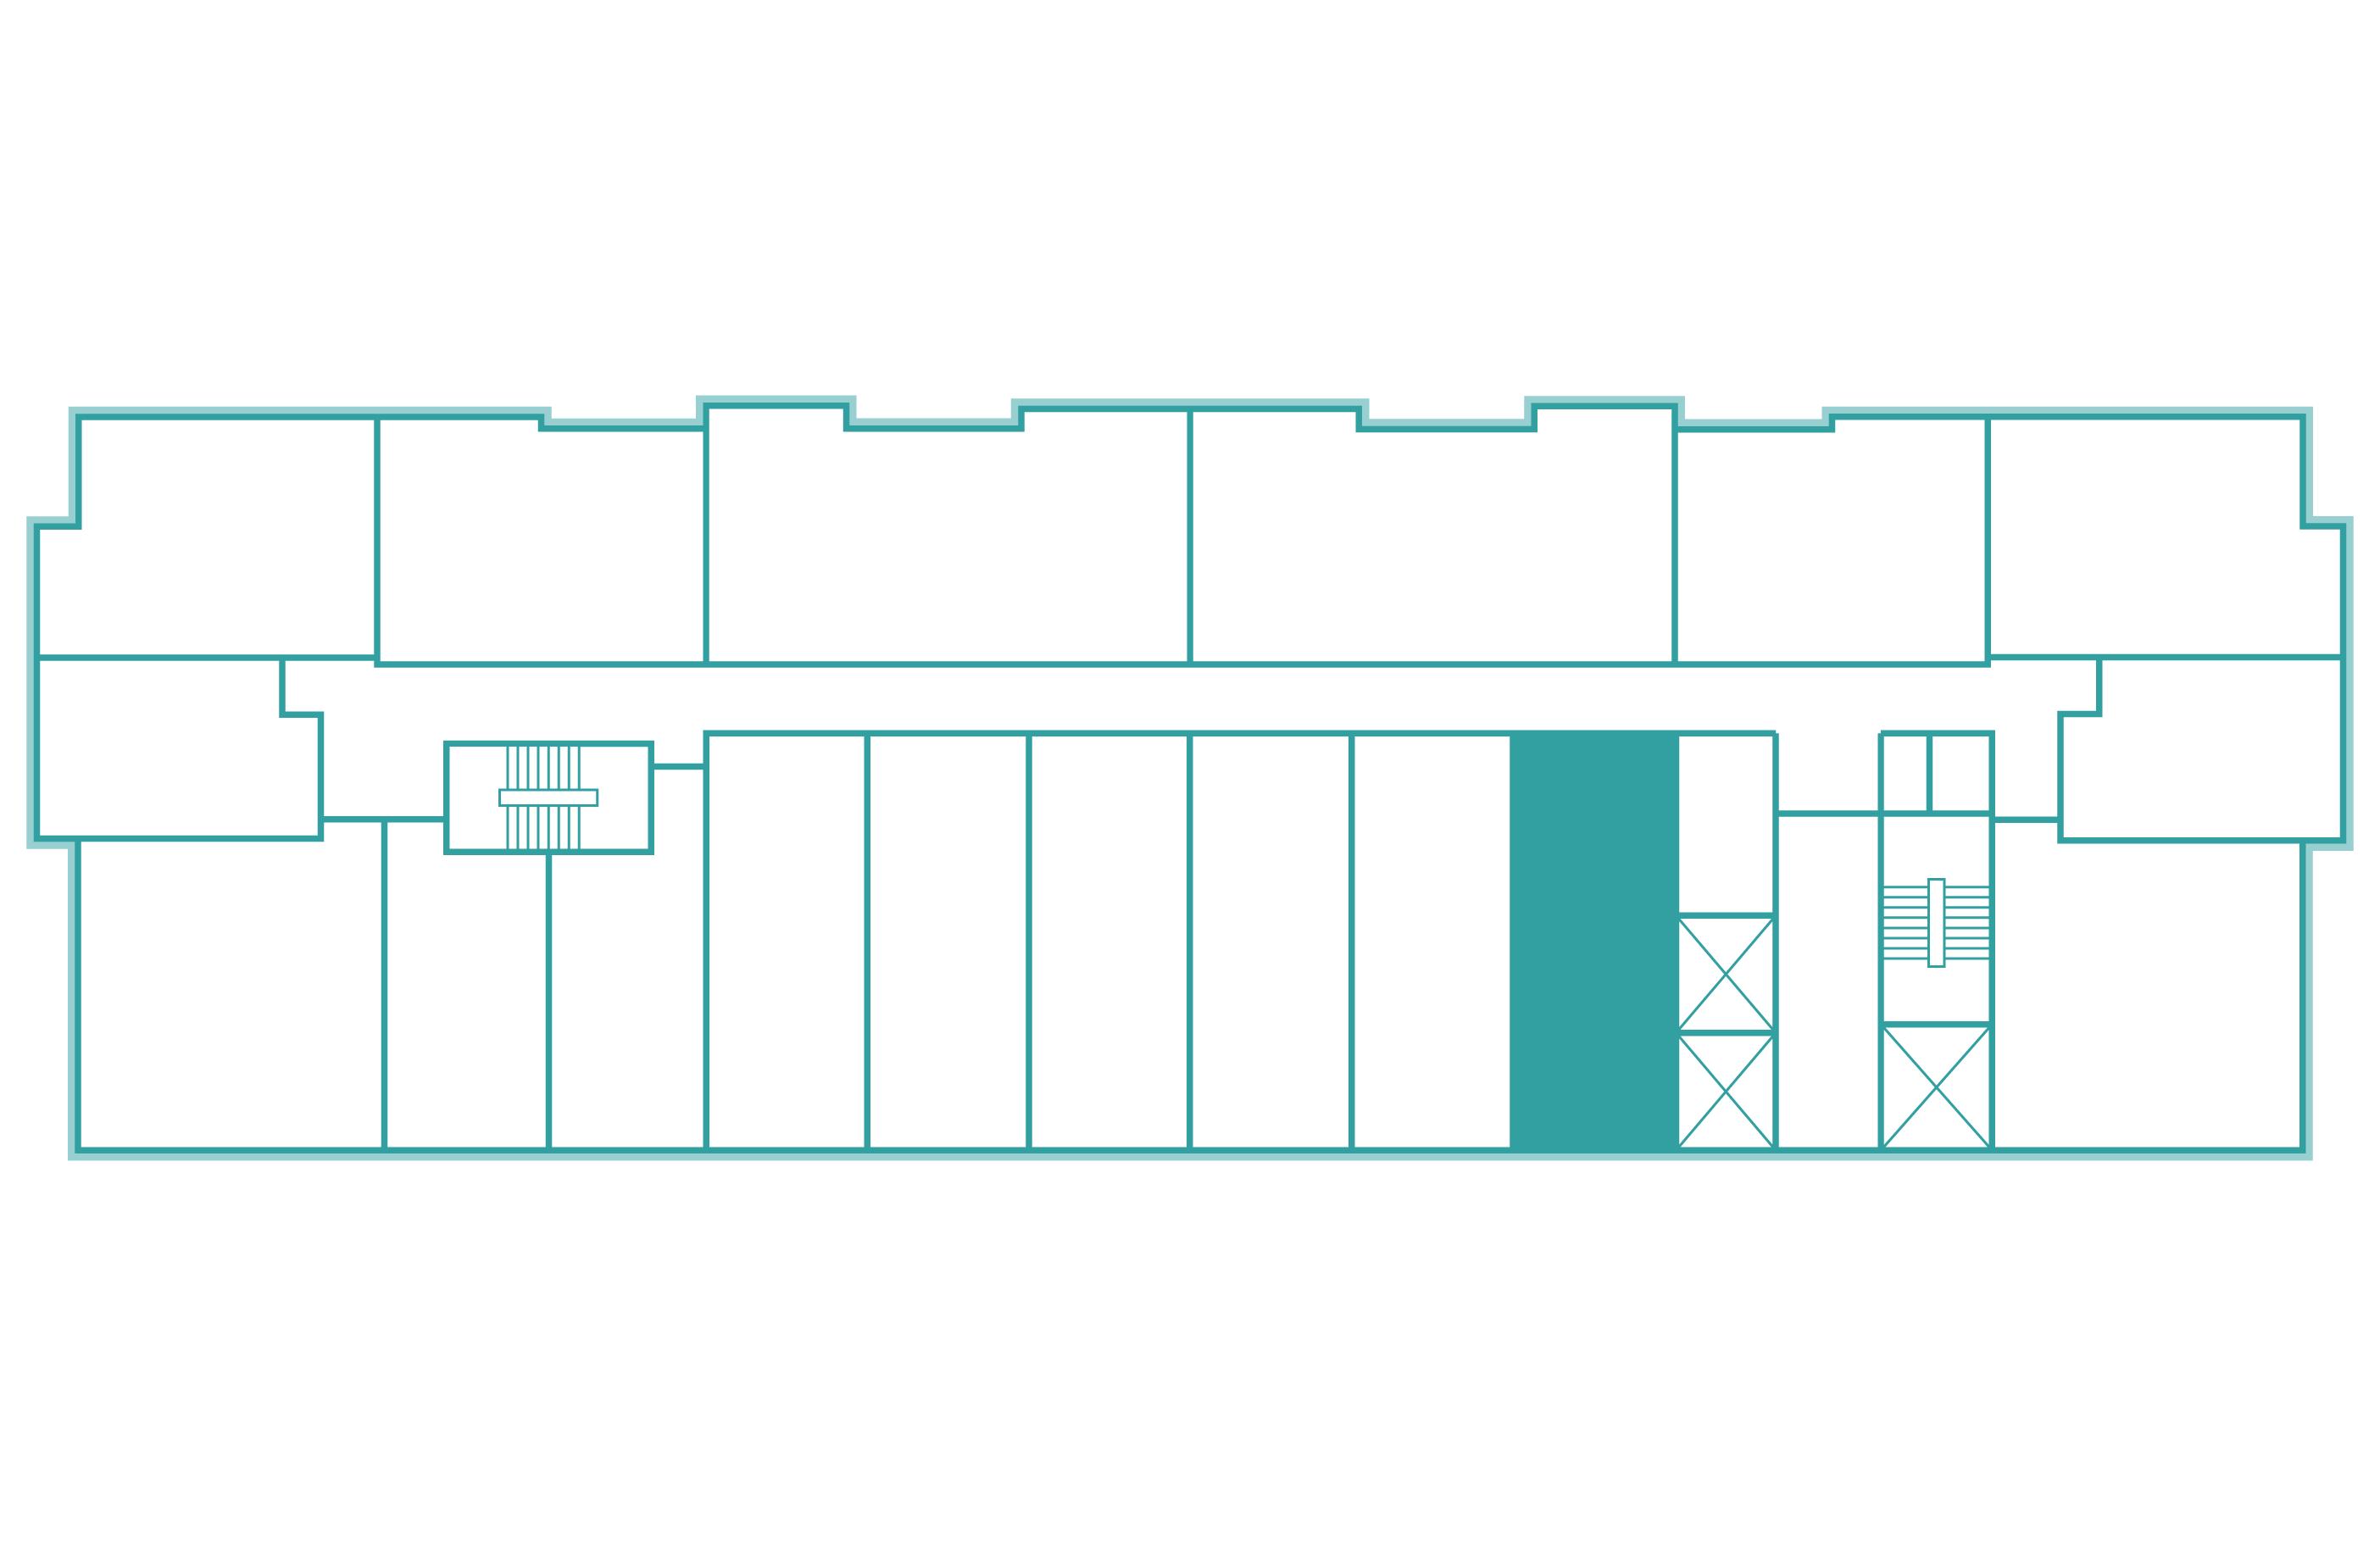 floorplan image of unit image 0601